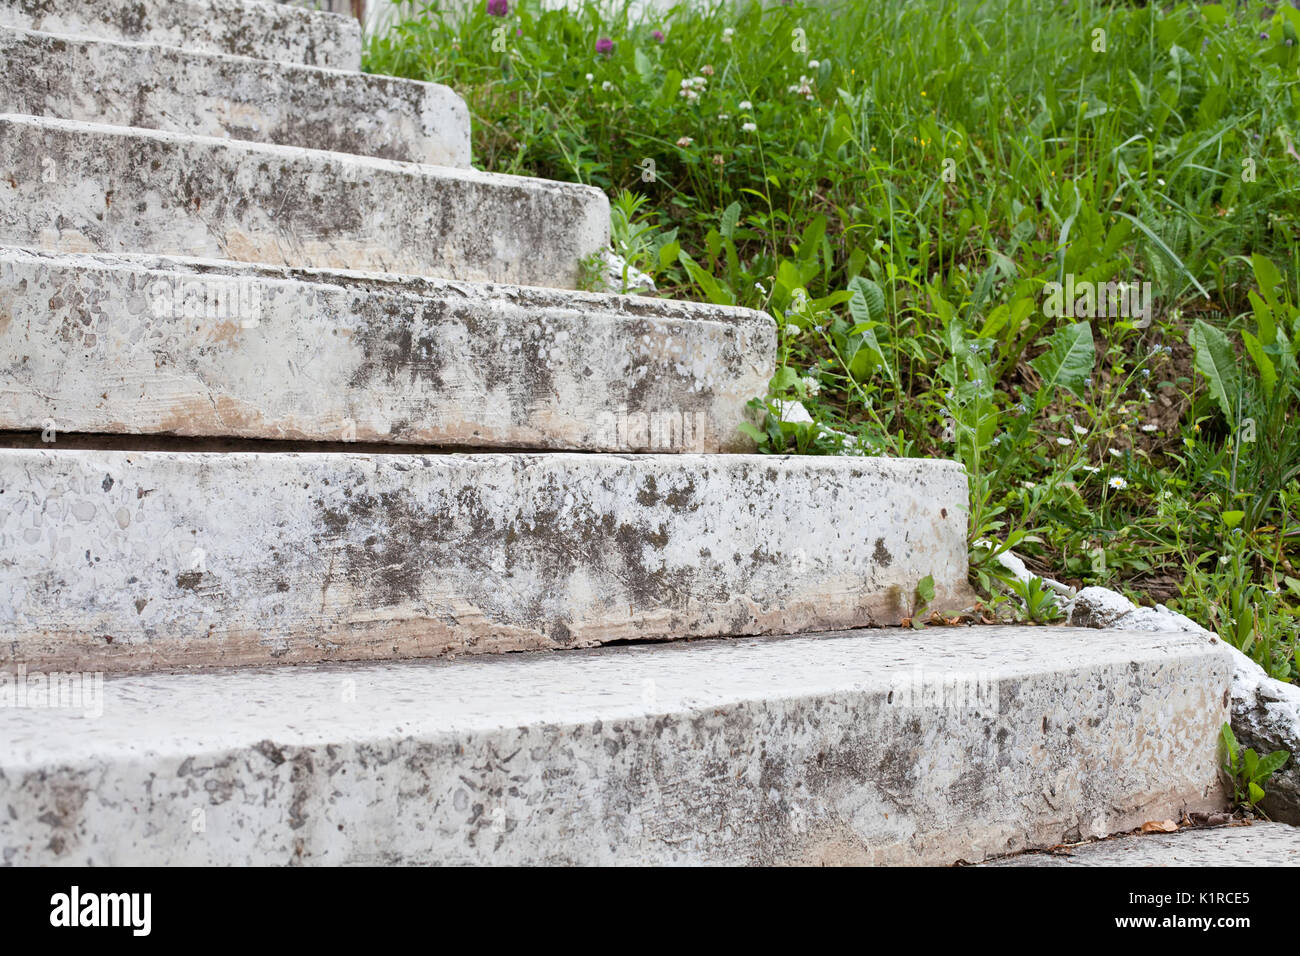 Aged white stone stairway - Stock Image